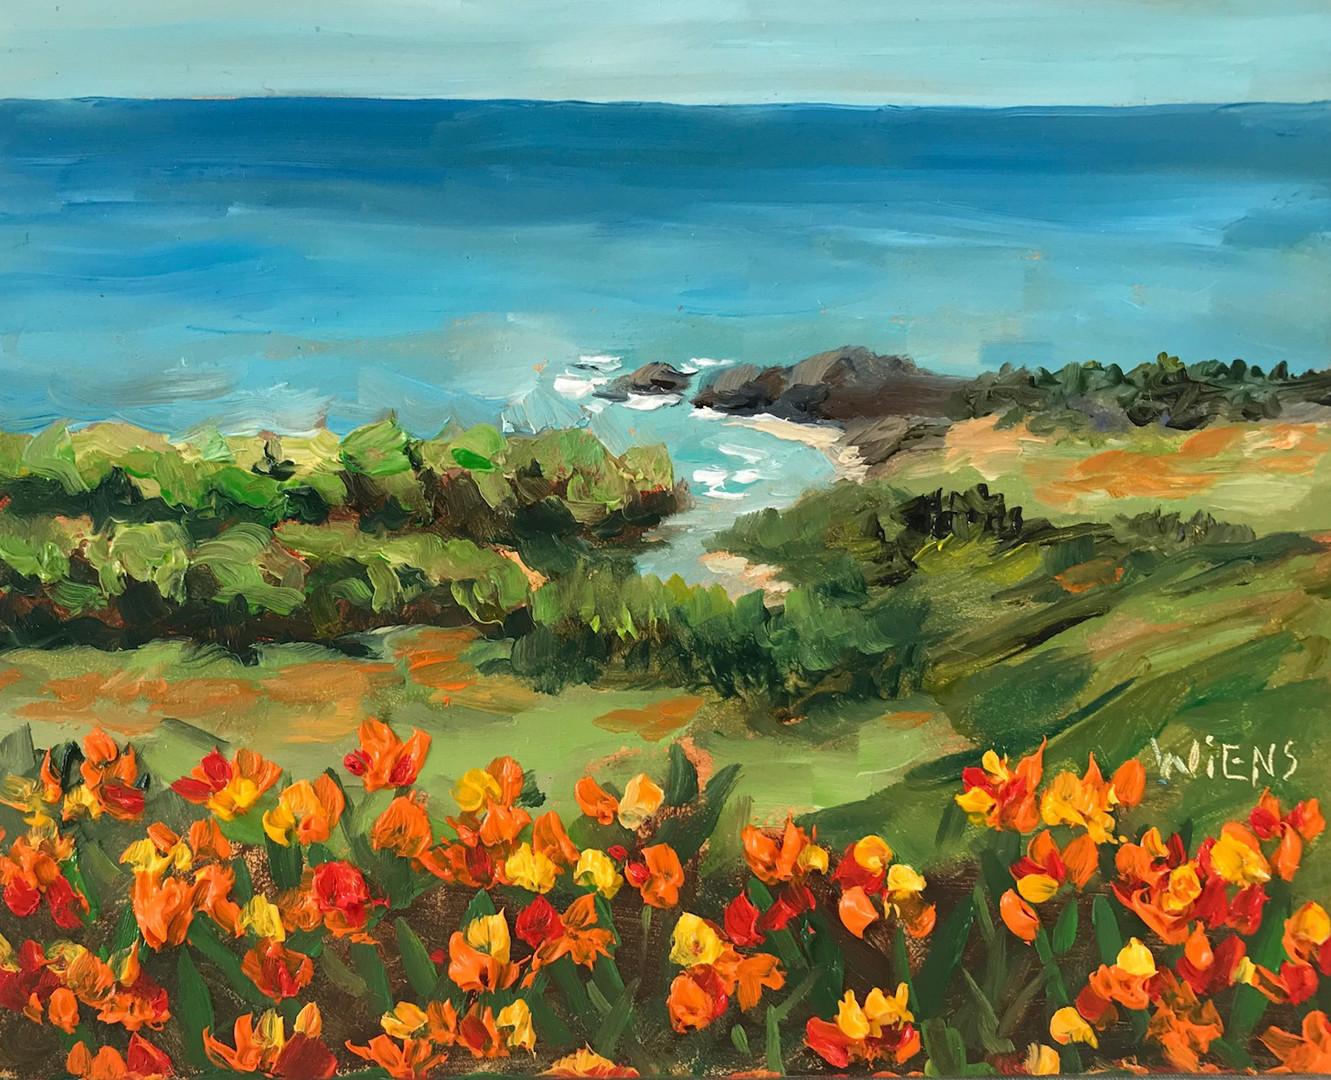 Coastal Poppies 4x5in #191.jpg